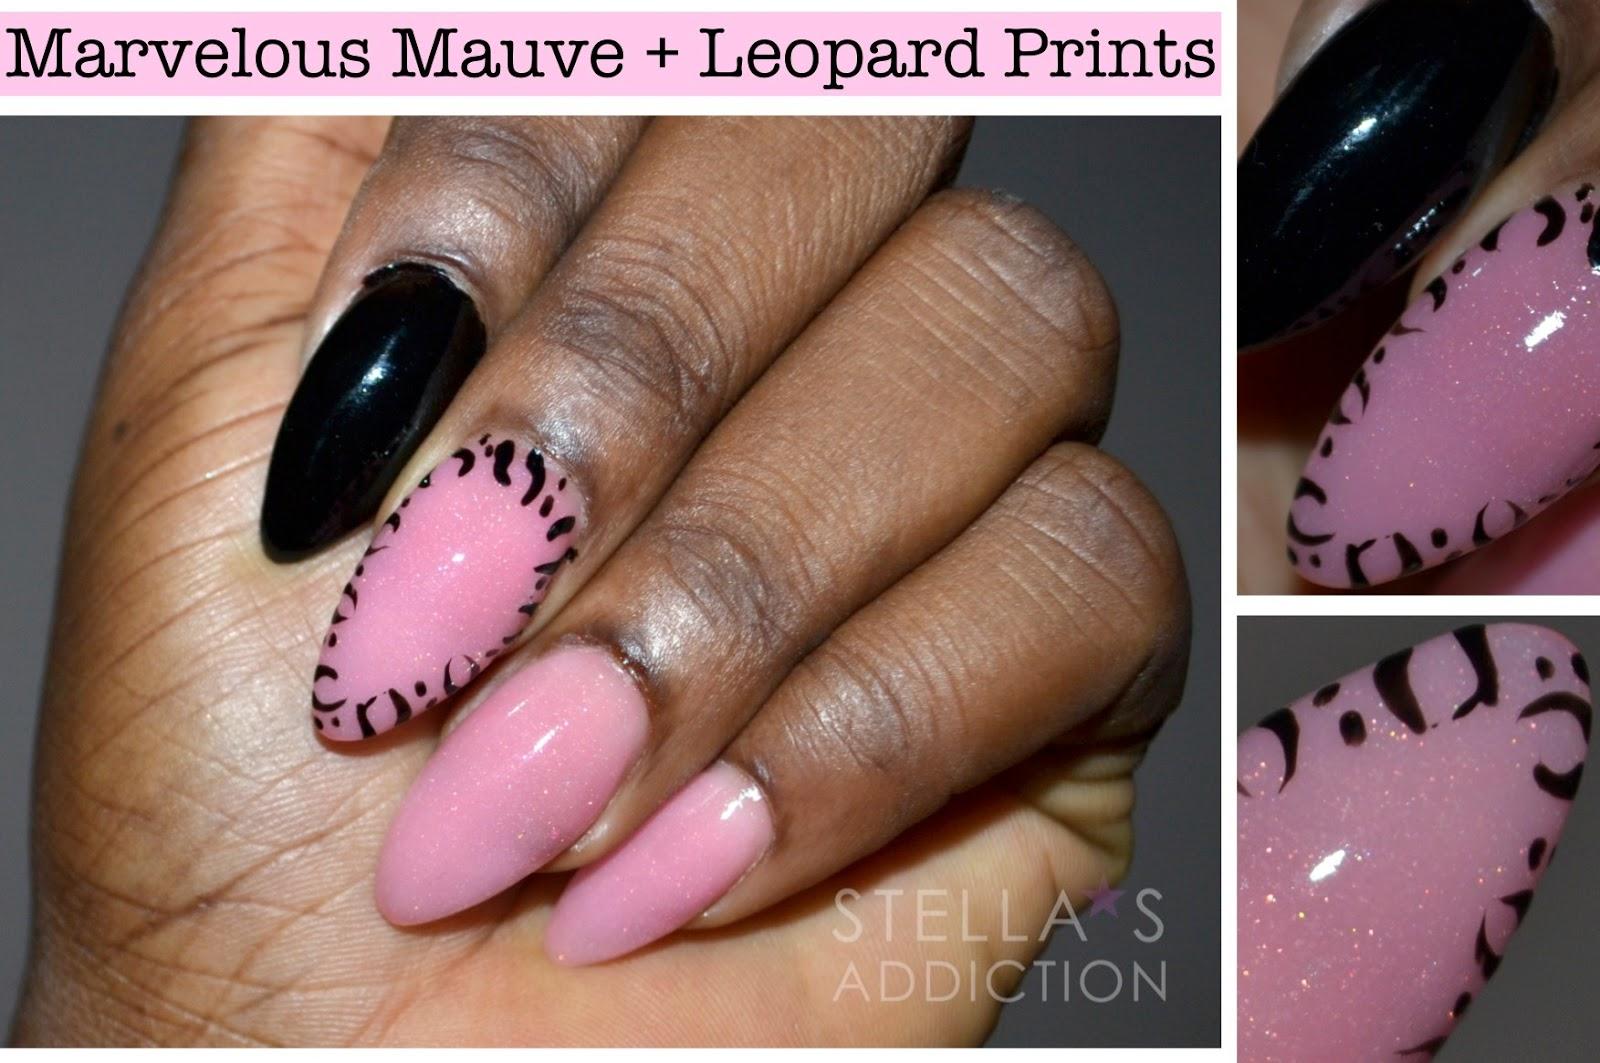 NOTD | Marvelous Mauve + Leopard Print Nail Art - Stella\'s Addiction